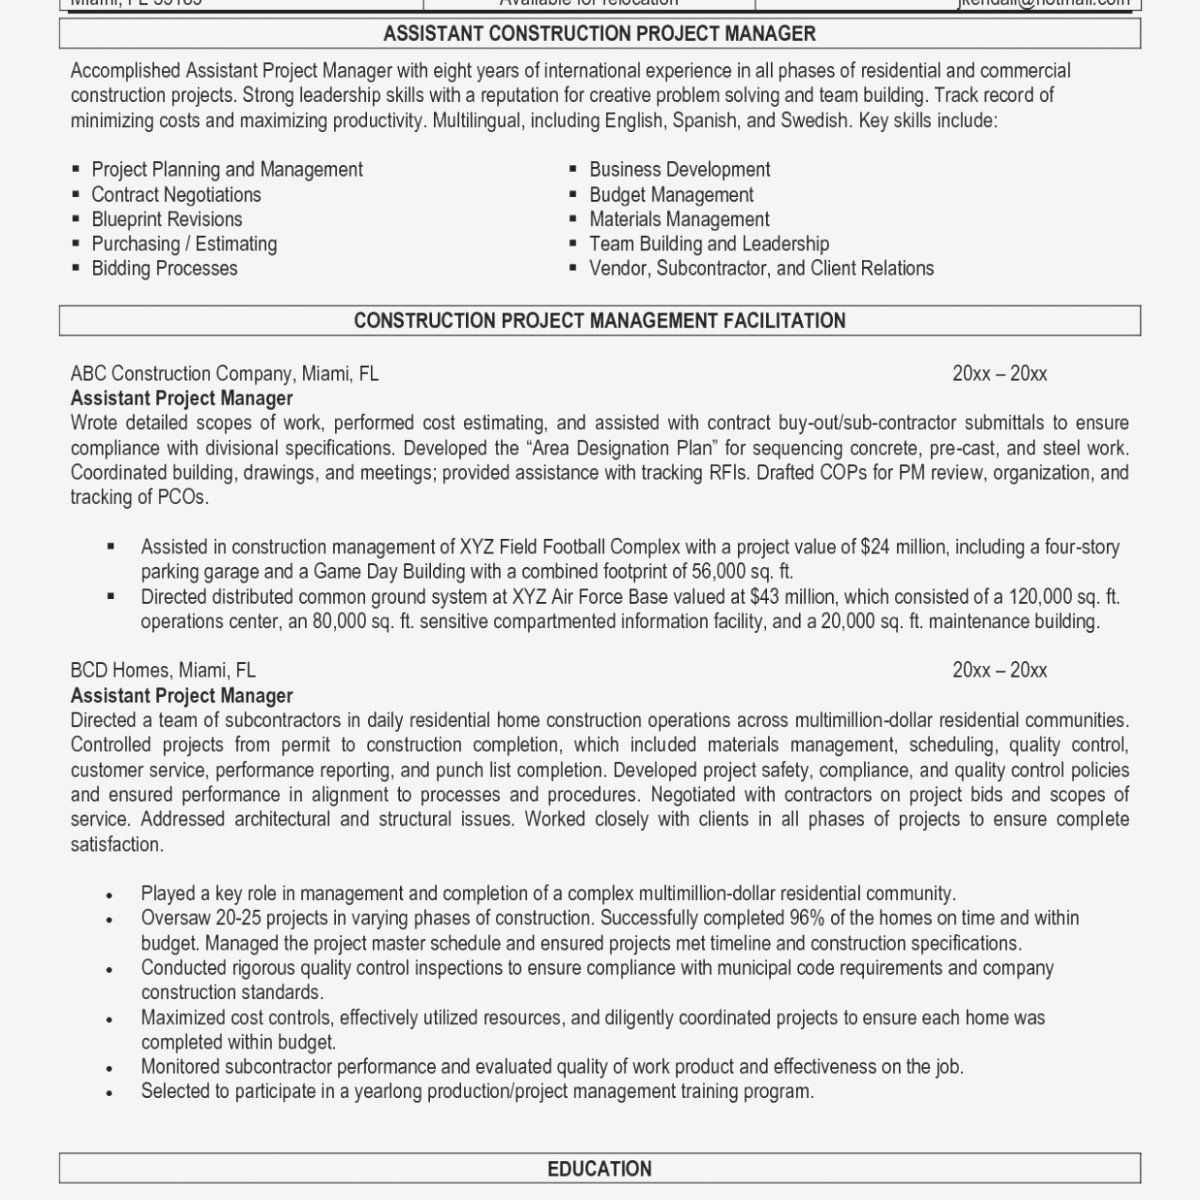 Business Development Manager Resume Sample Lovely Vendor Management Project Manager Resume Salumgui Project Manager Resume Job Resume Examples Manager Resume